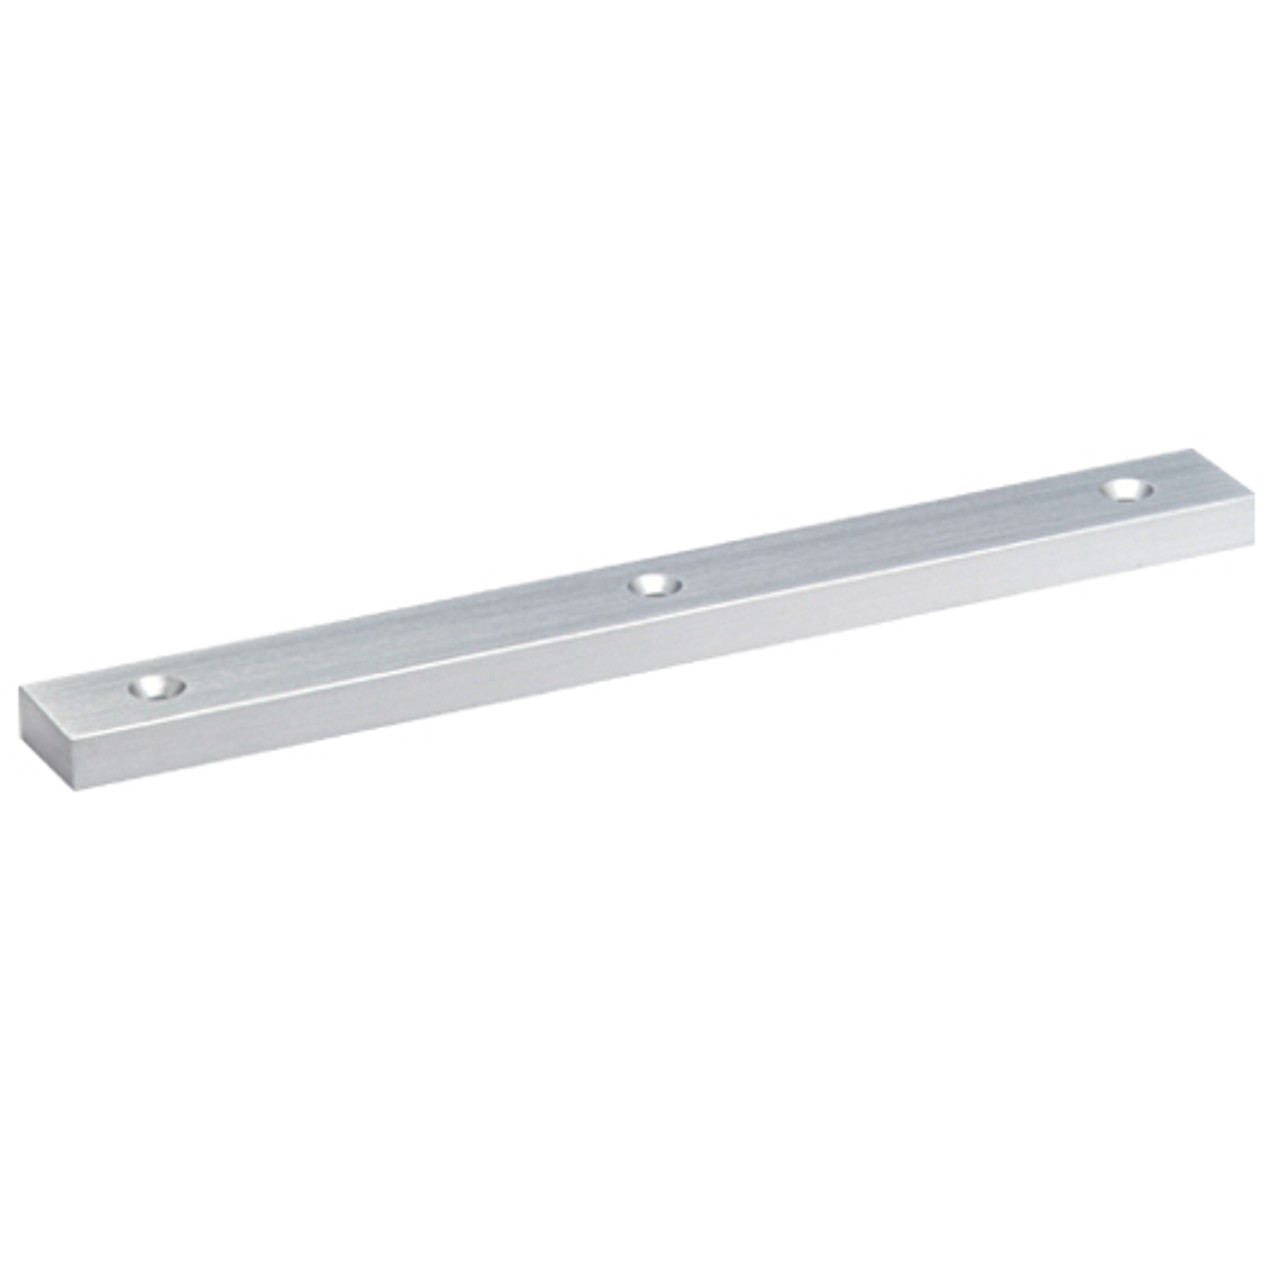 4441-US26 DynaLock 4000 Series Filler Plates for Single Maglocks in Bright Chrome